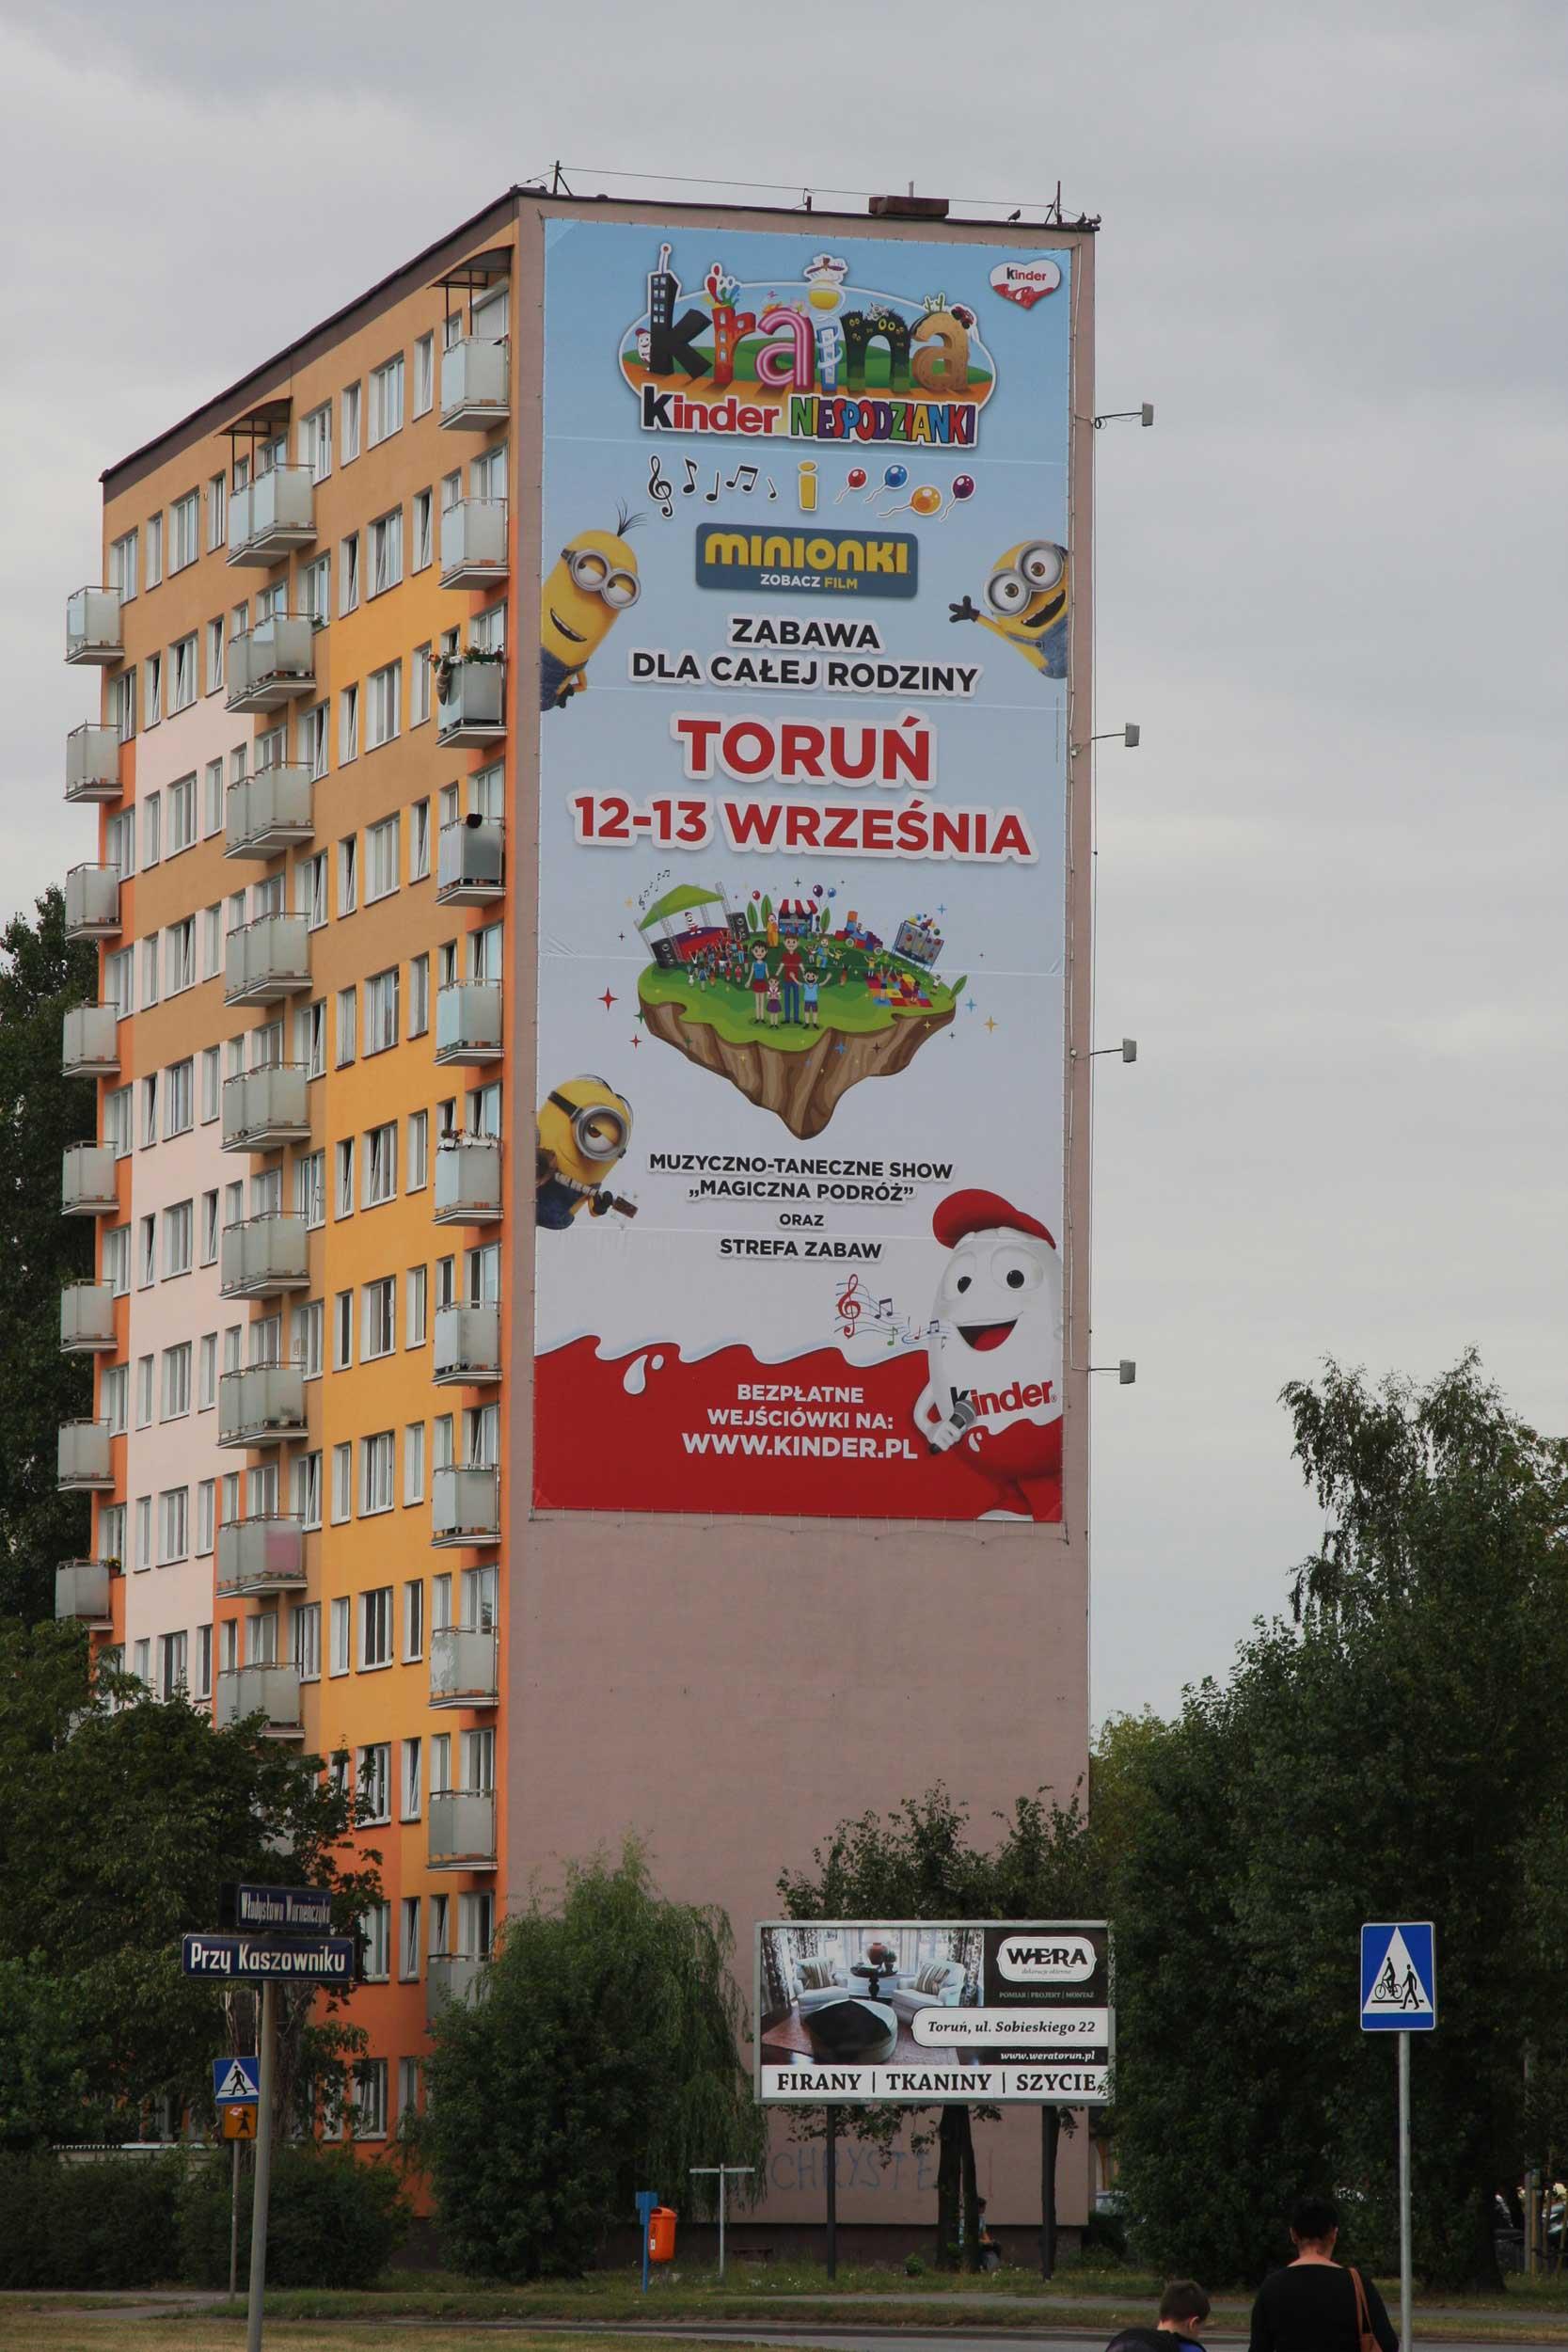 Siatki16 Duzyformatcompl Legendarna Drukarnia Toruń